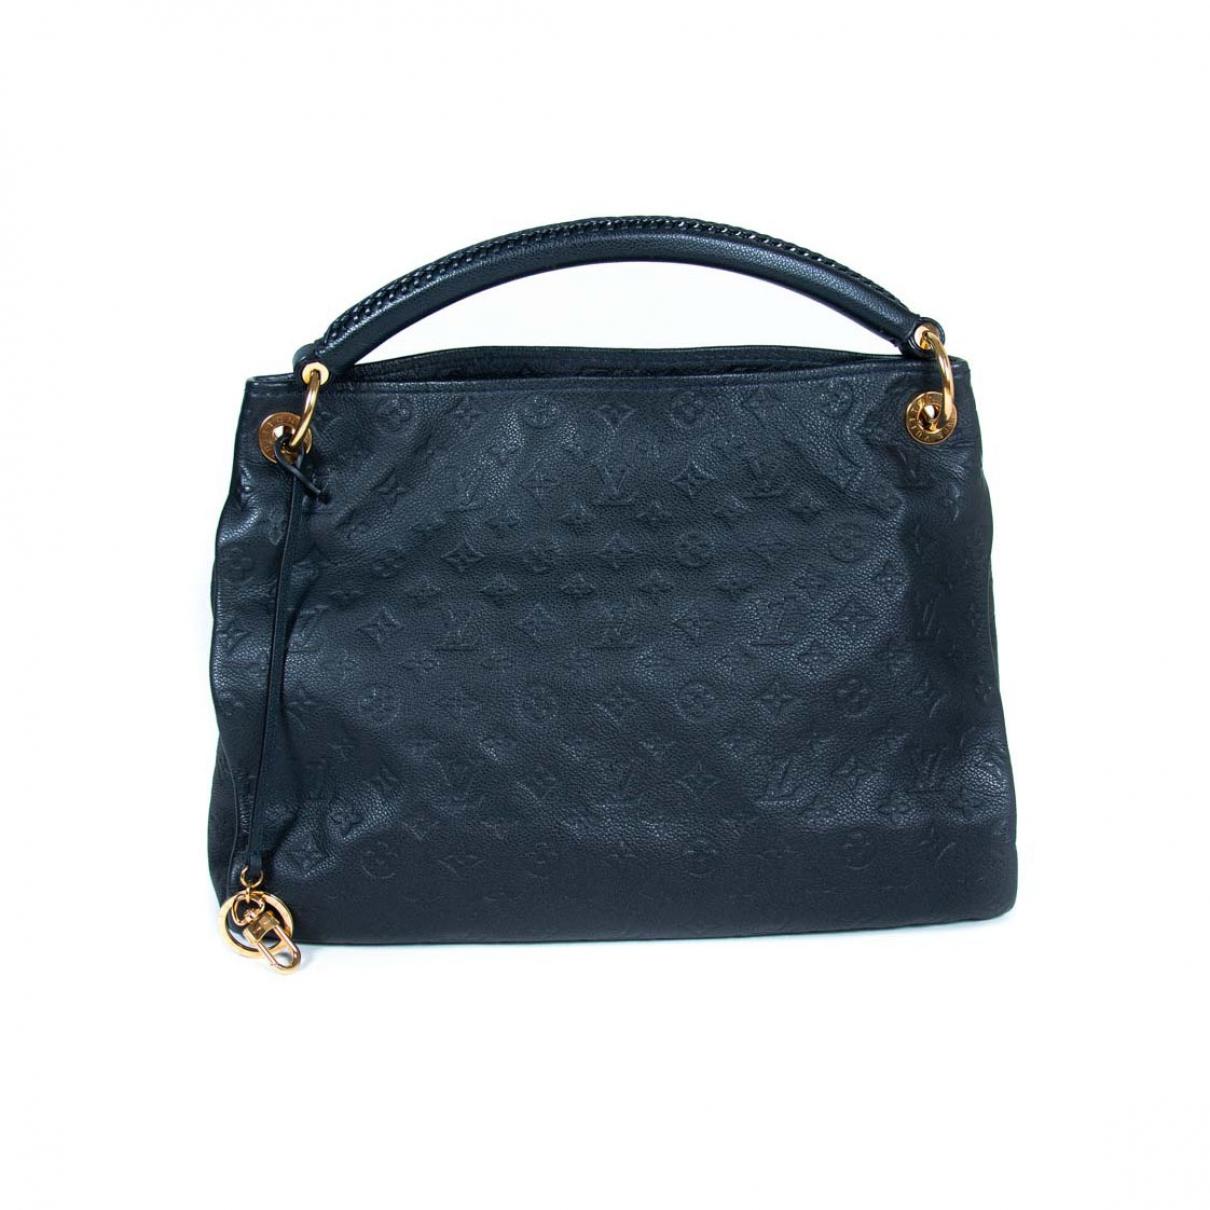 Louis Vuitton Artsy Navy Leather handbag for Women \N